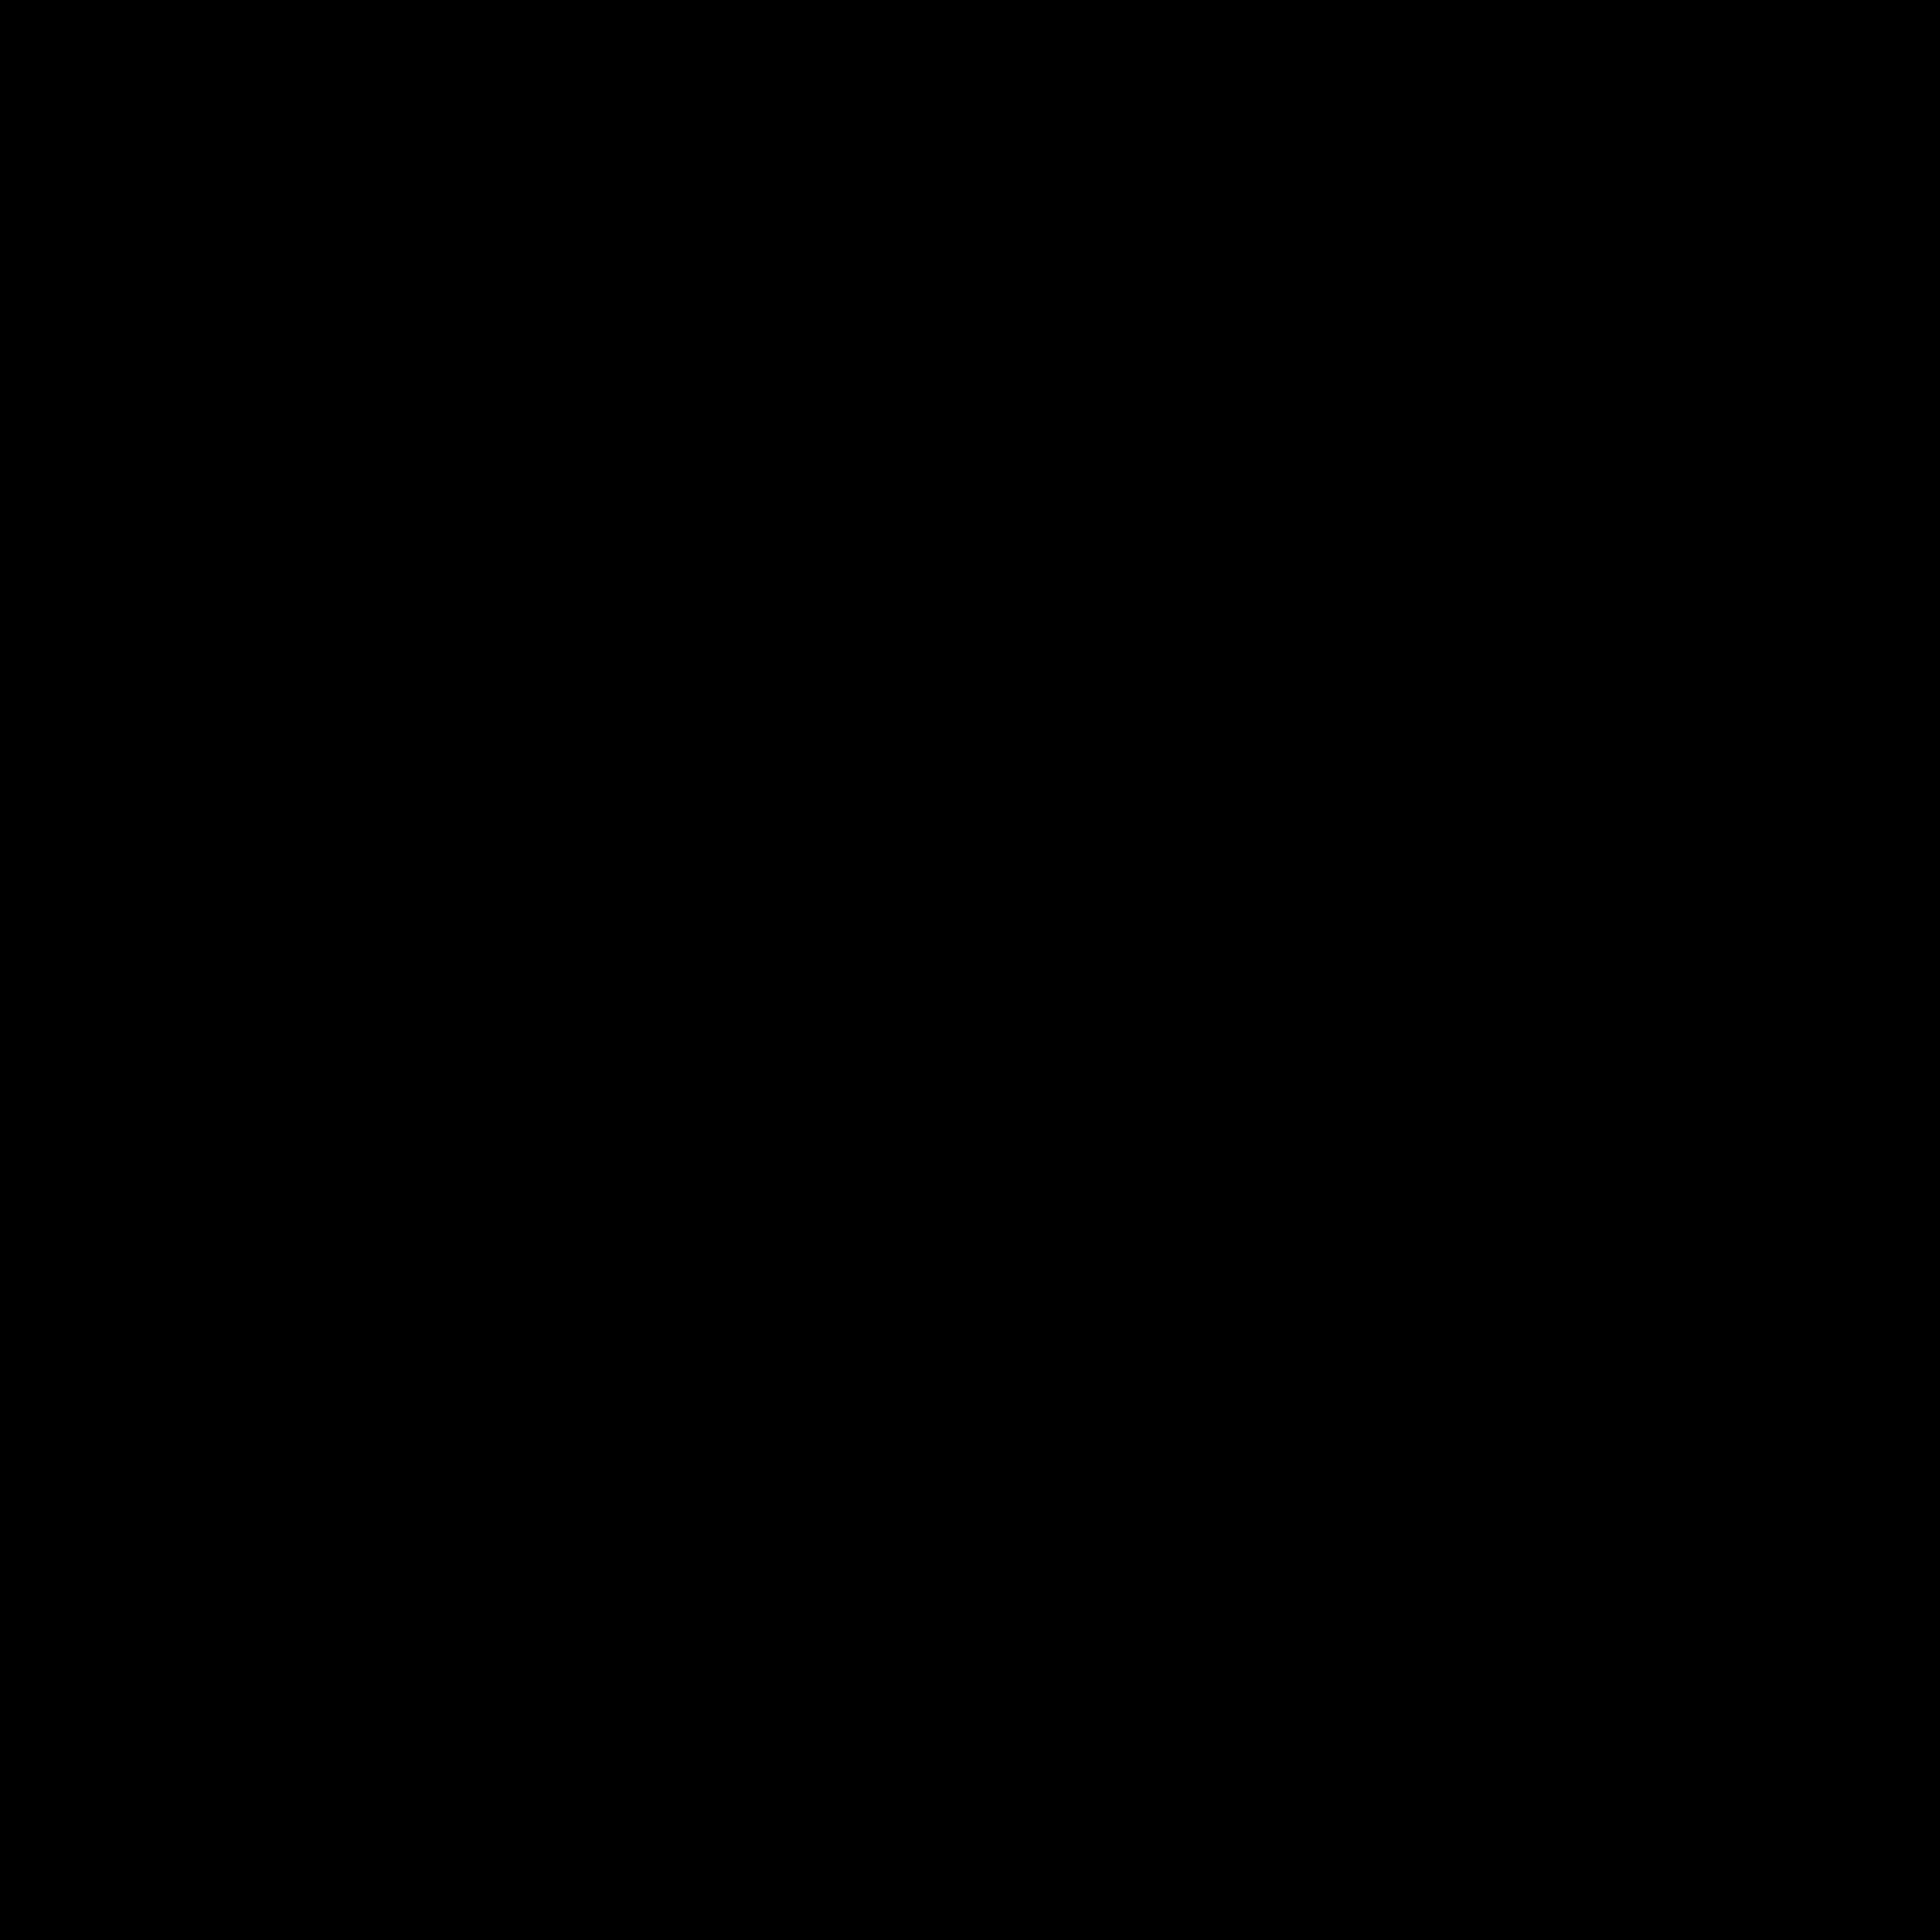 partner_logos-02.png